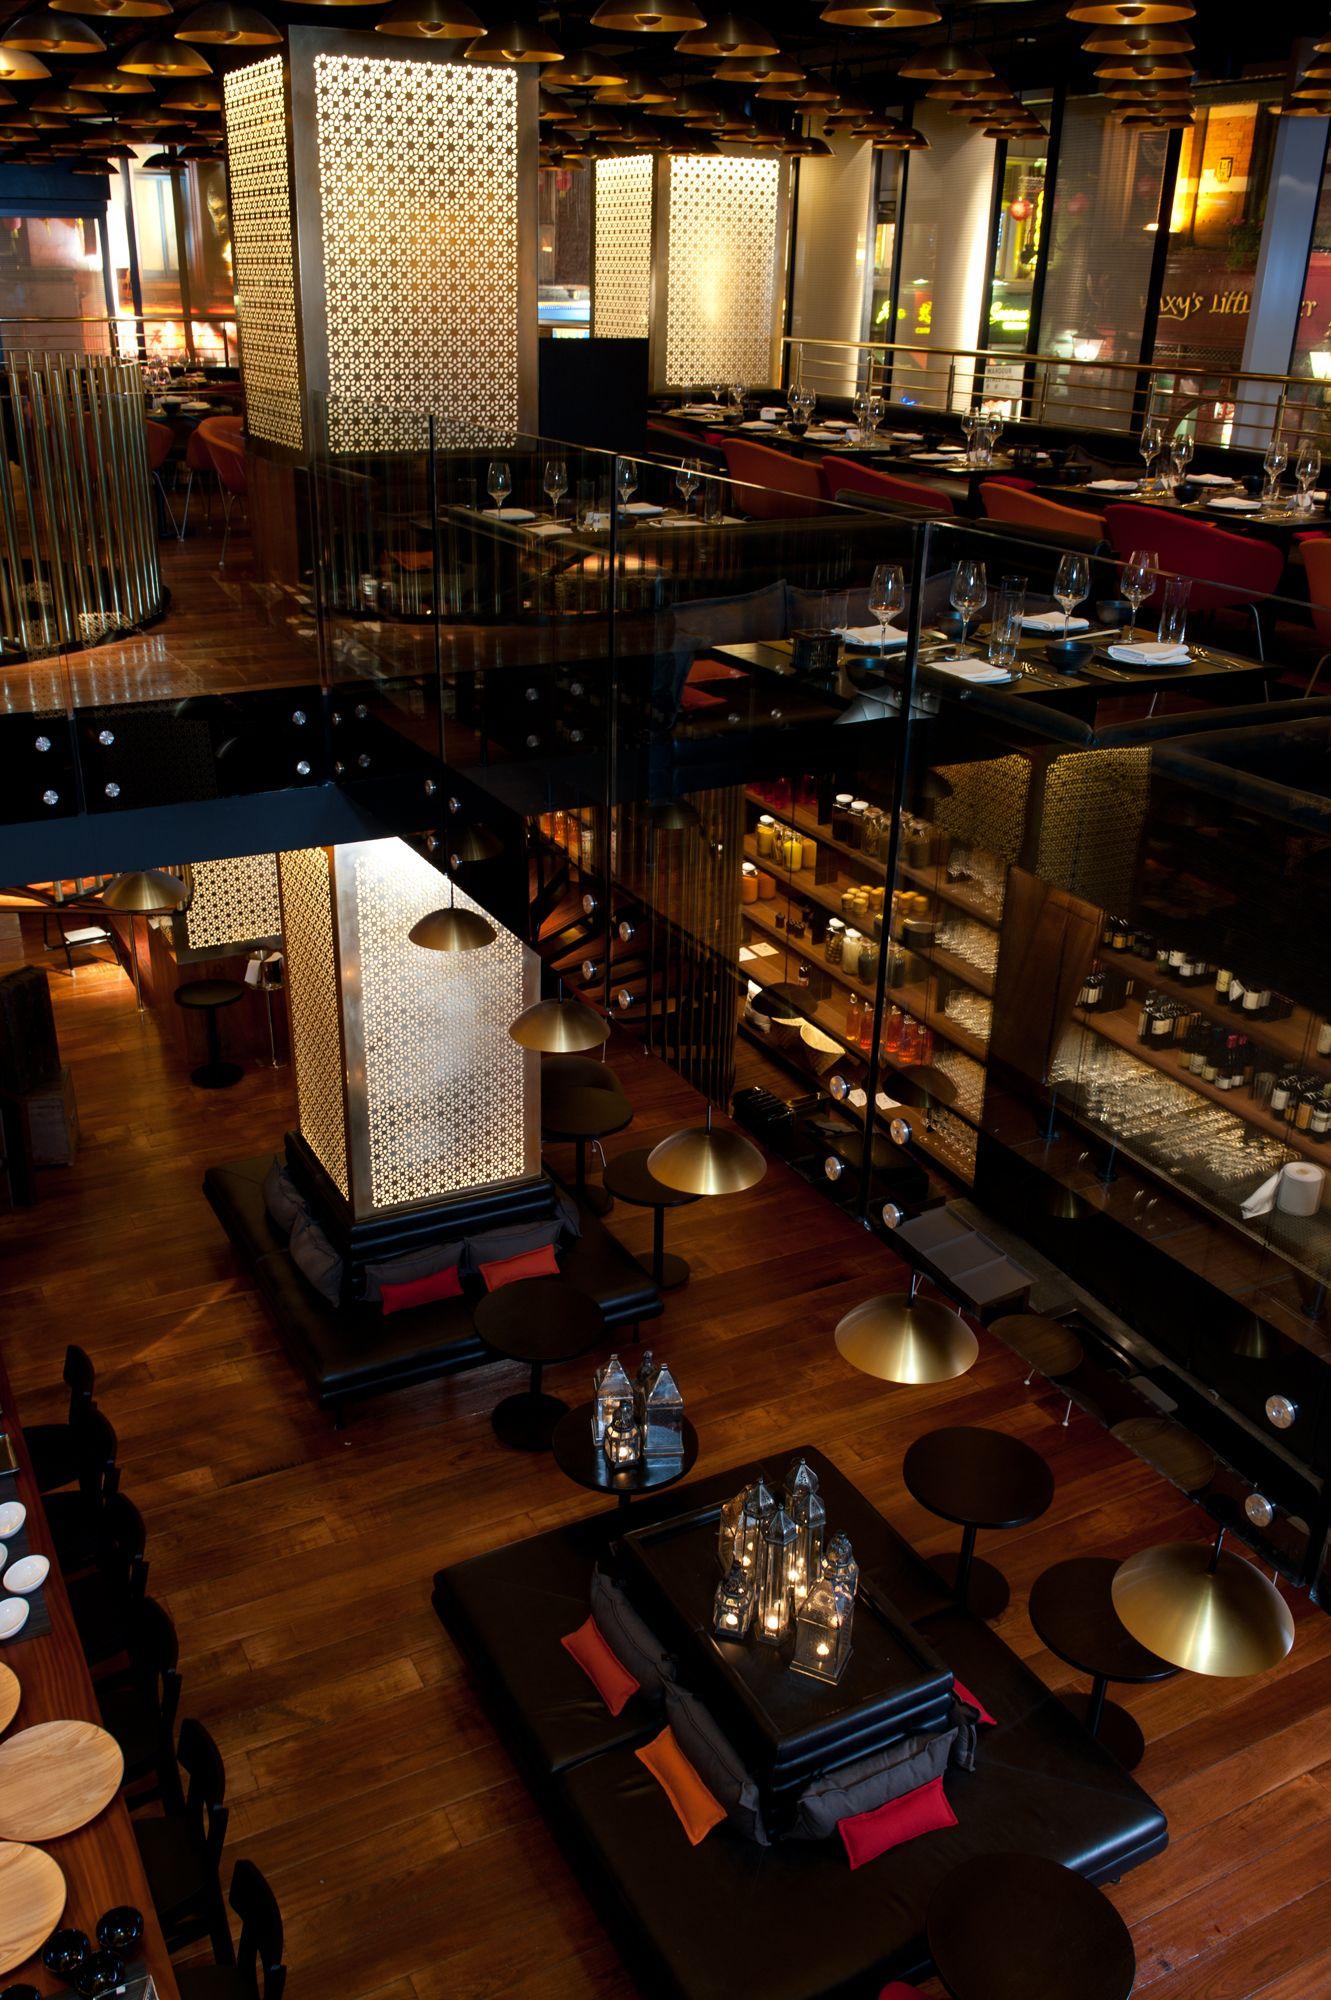 European Hotel Design Awards – Restaurant Interior Design of the Year 2011 (Spice Market London